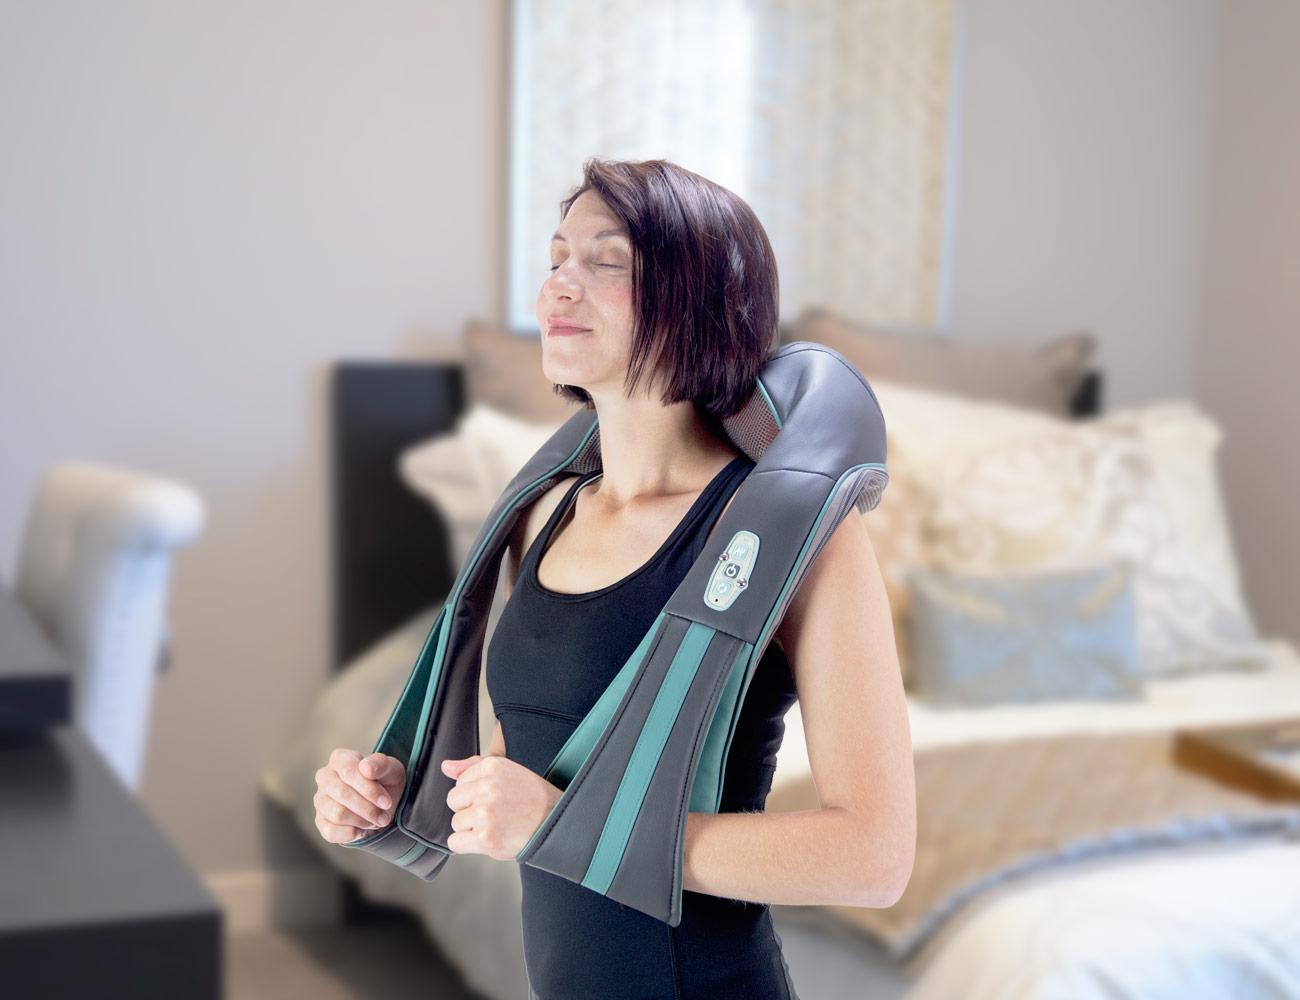 InstaShiatsu+ Neck and Back Massager with Heat